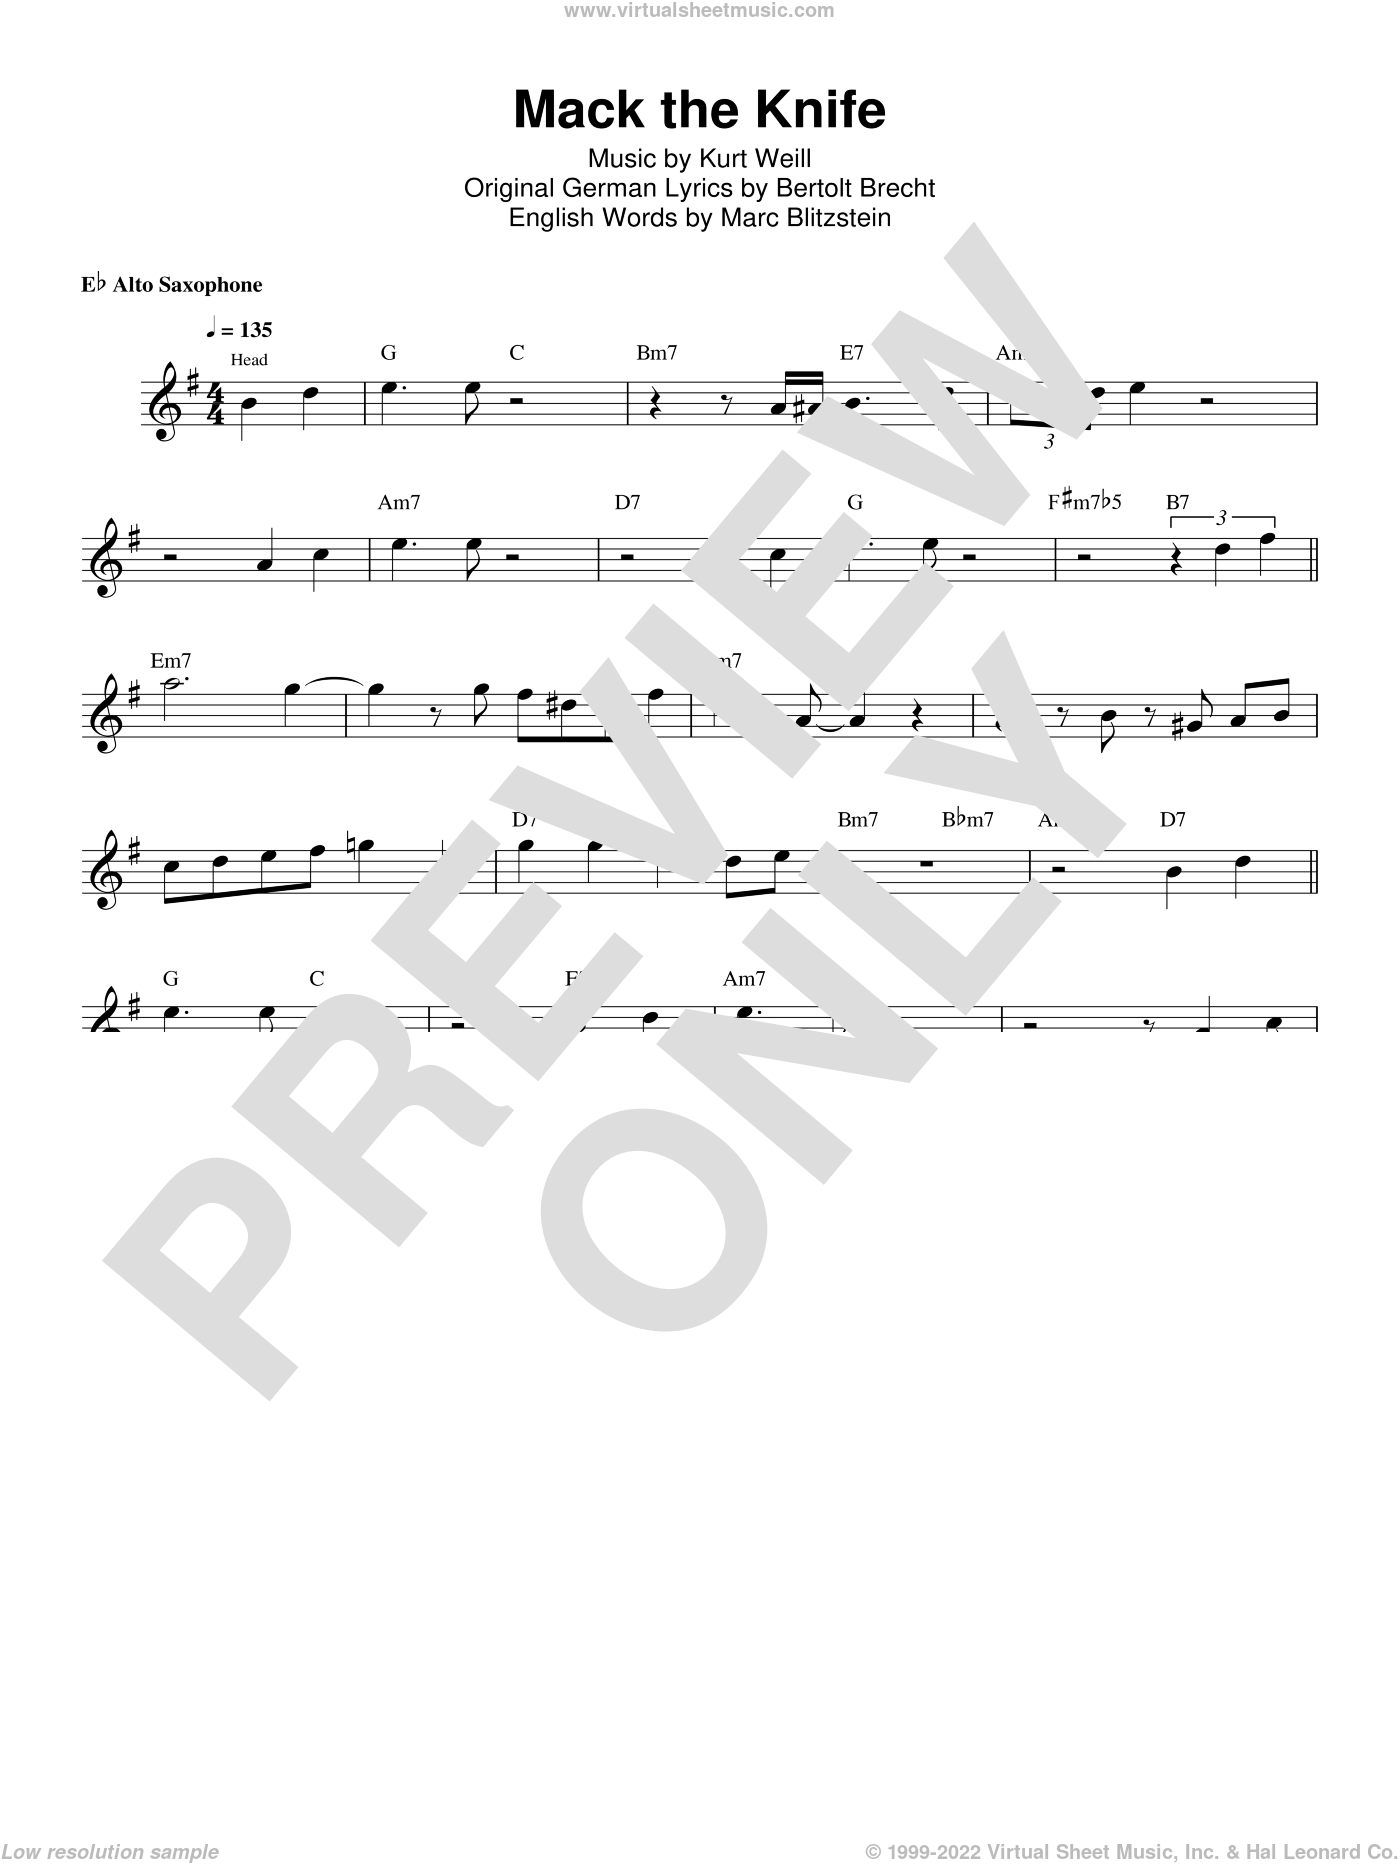 Mack The Knife sheet music for alto saxophone (transcription) by Kenny Garrett, Bertolt Brecht, Kurt Weill and Marc Blitzstein, intermediate skill level